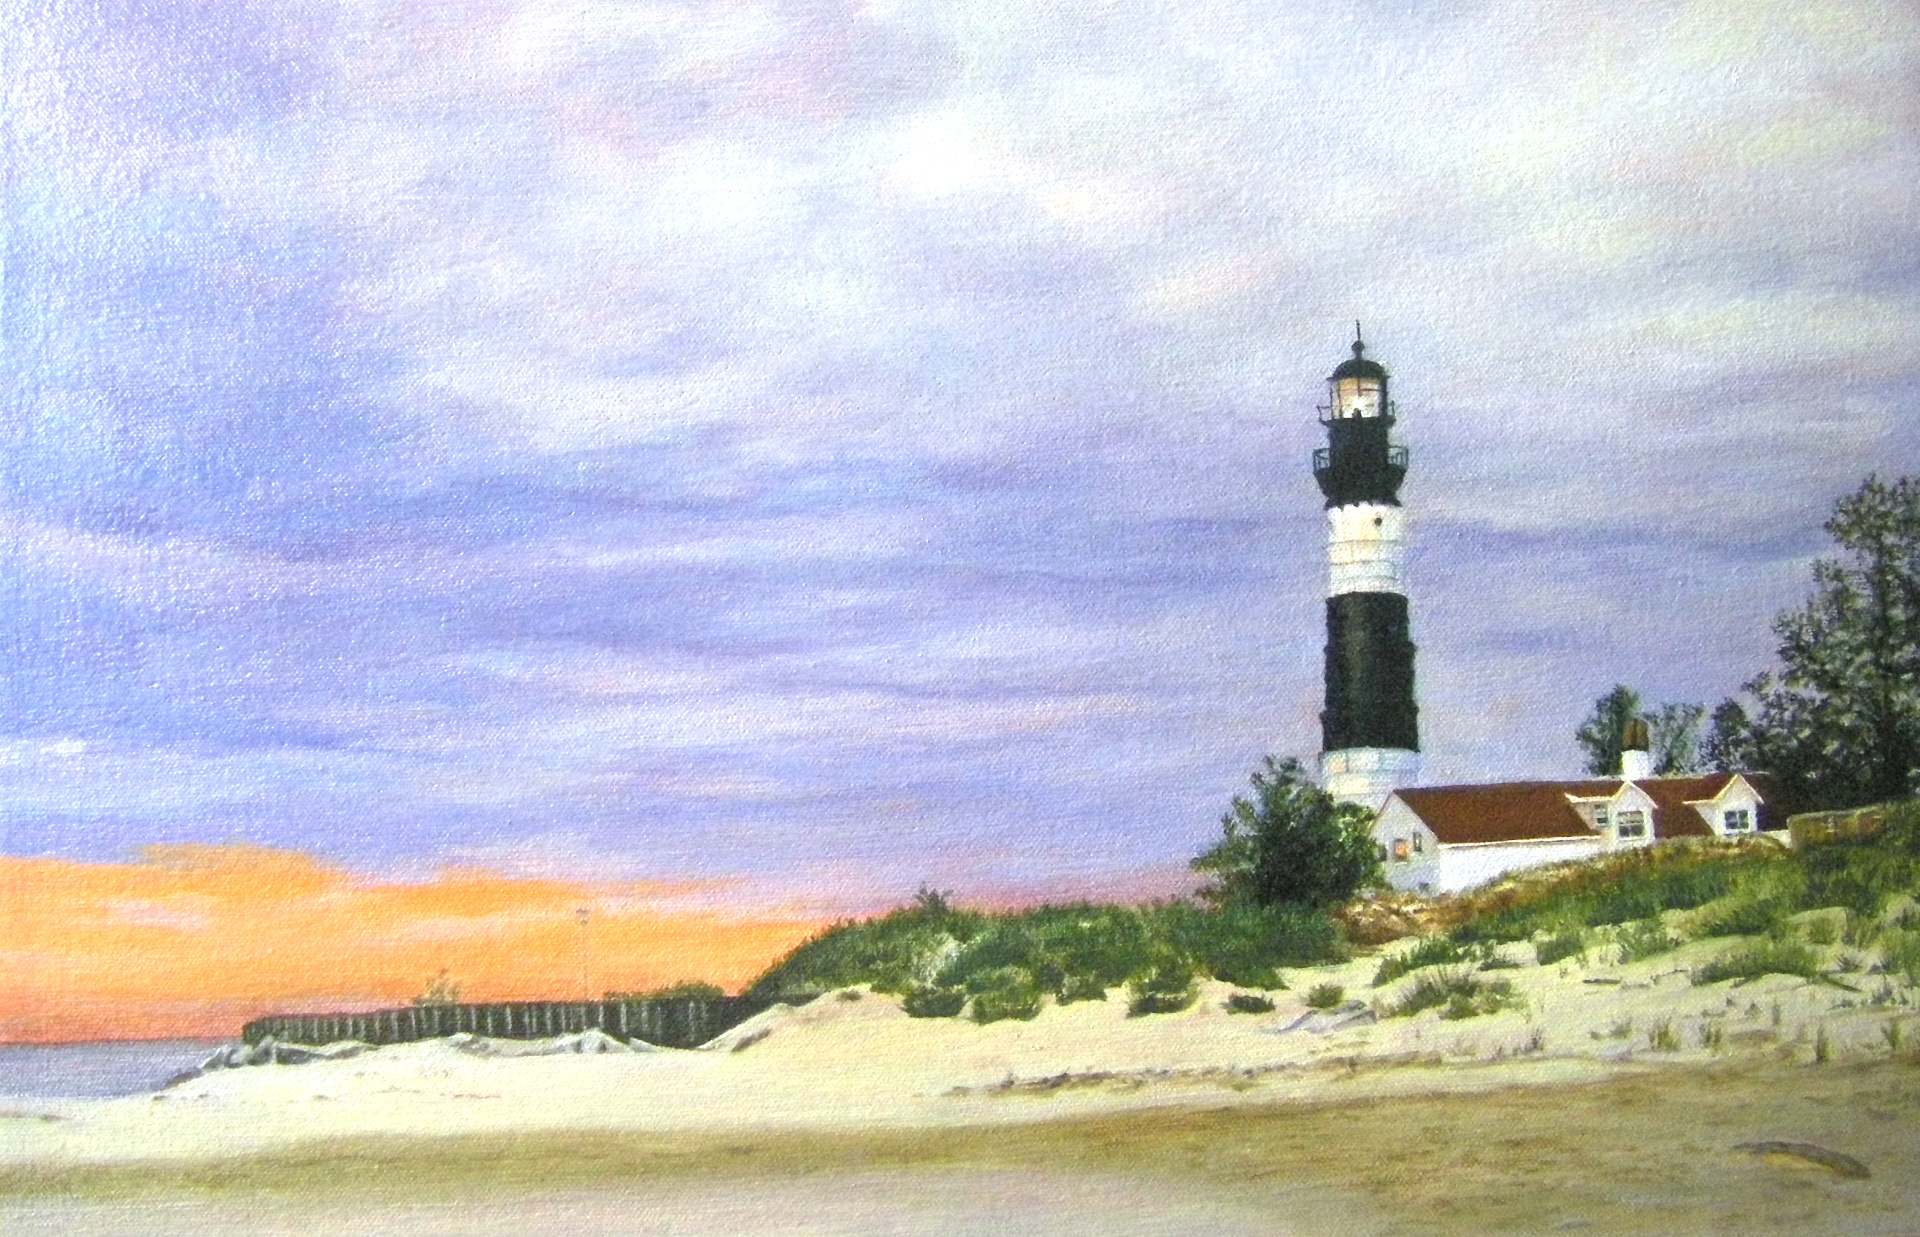 28. Big Sables Lighthouse